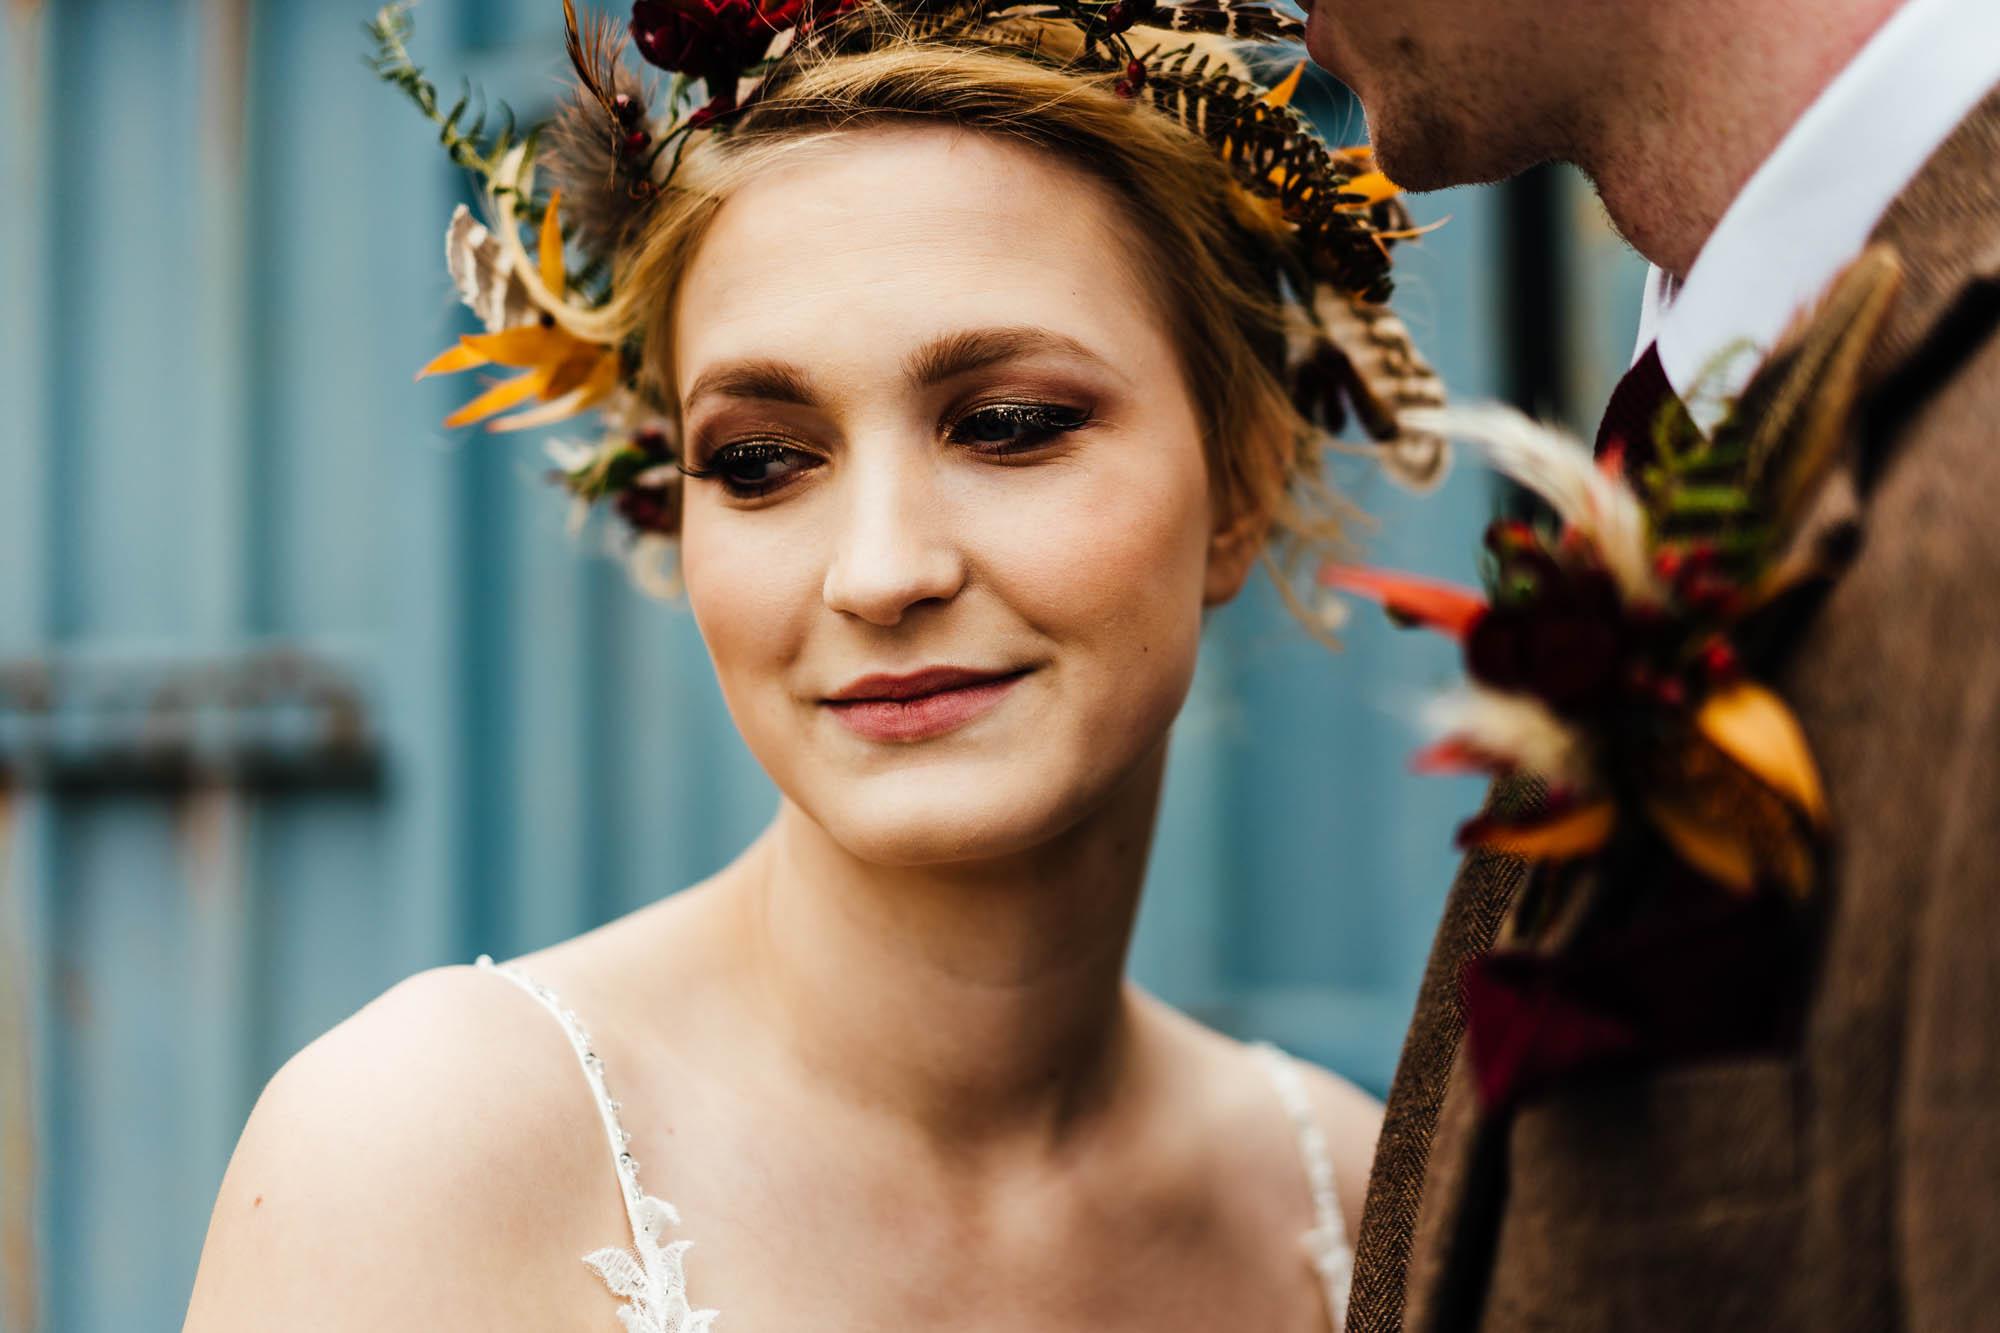 huntsmill-farm-wedding-inspiration-18